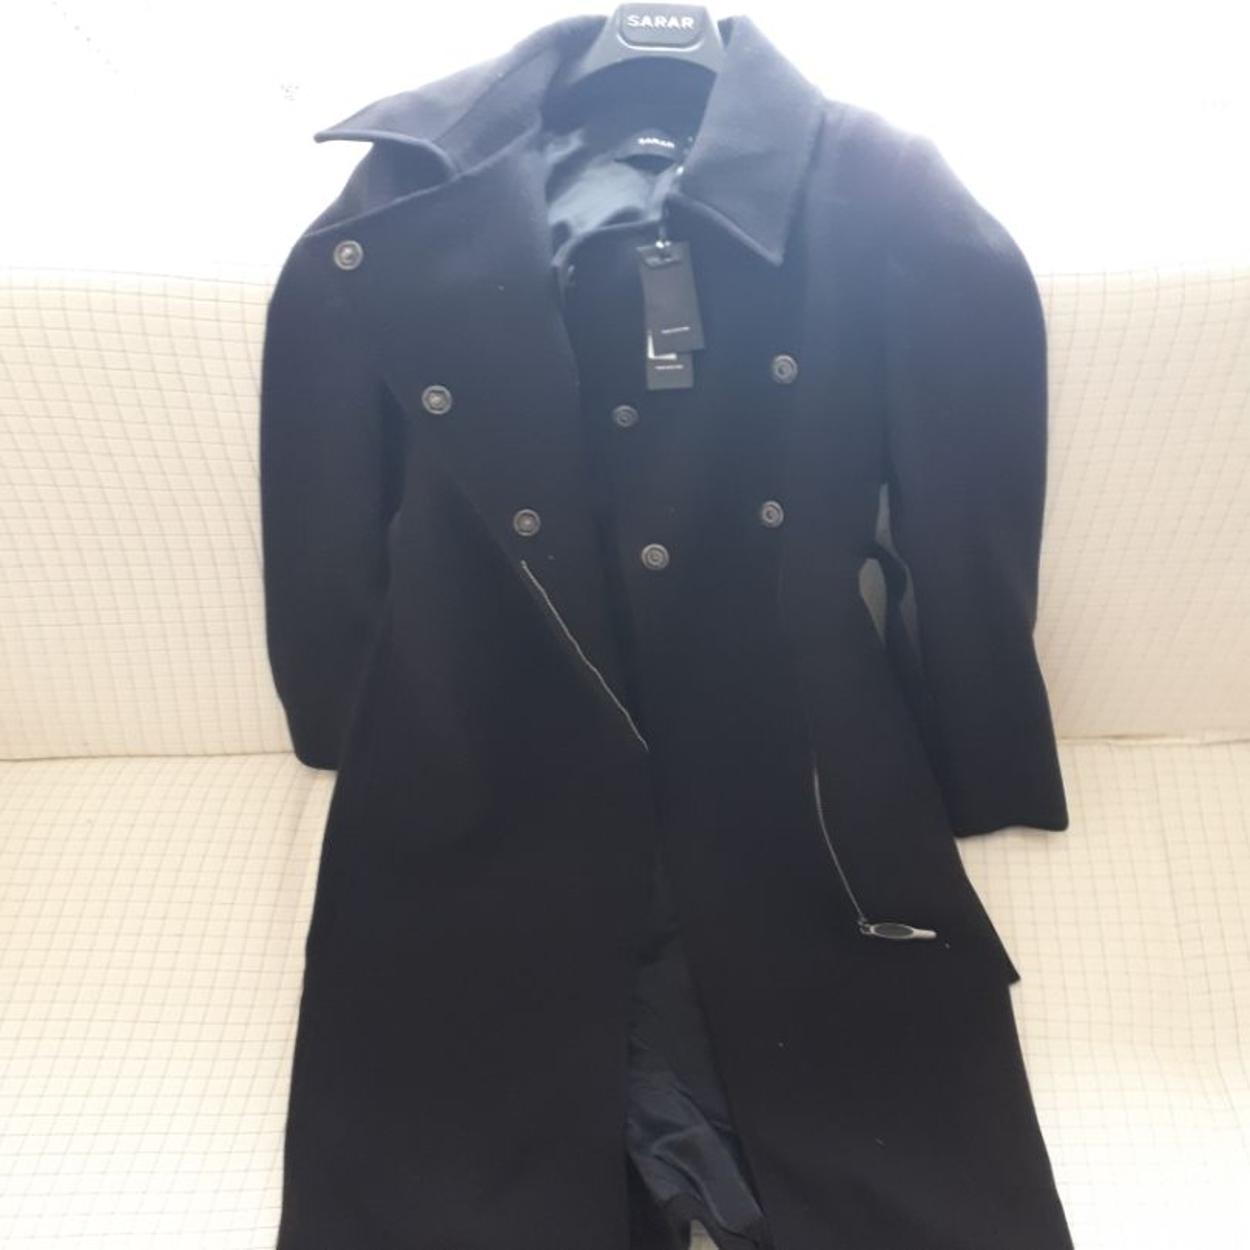 Sarar Kaban/Palto